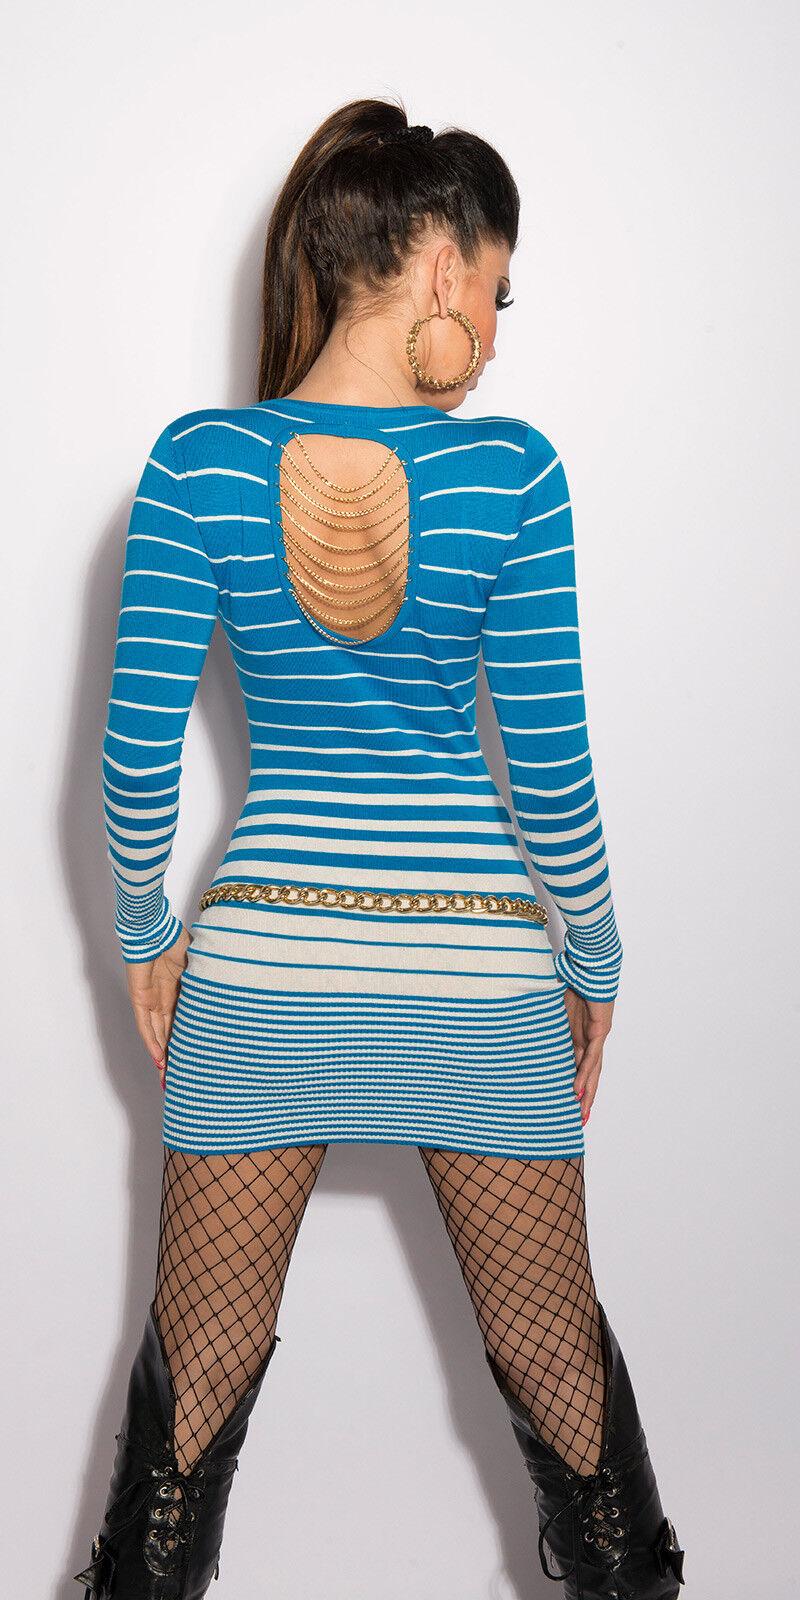 VESTIDO DE PUNTO MINIVESTIDO KOUCLA Suéter Suéter Suéter Largo Jersey cadena espalda sexy 94fbdc